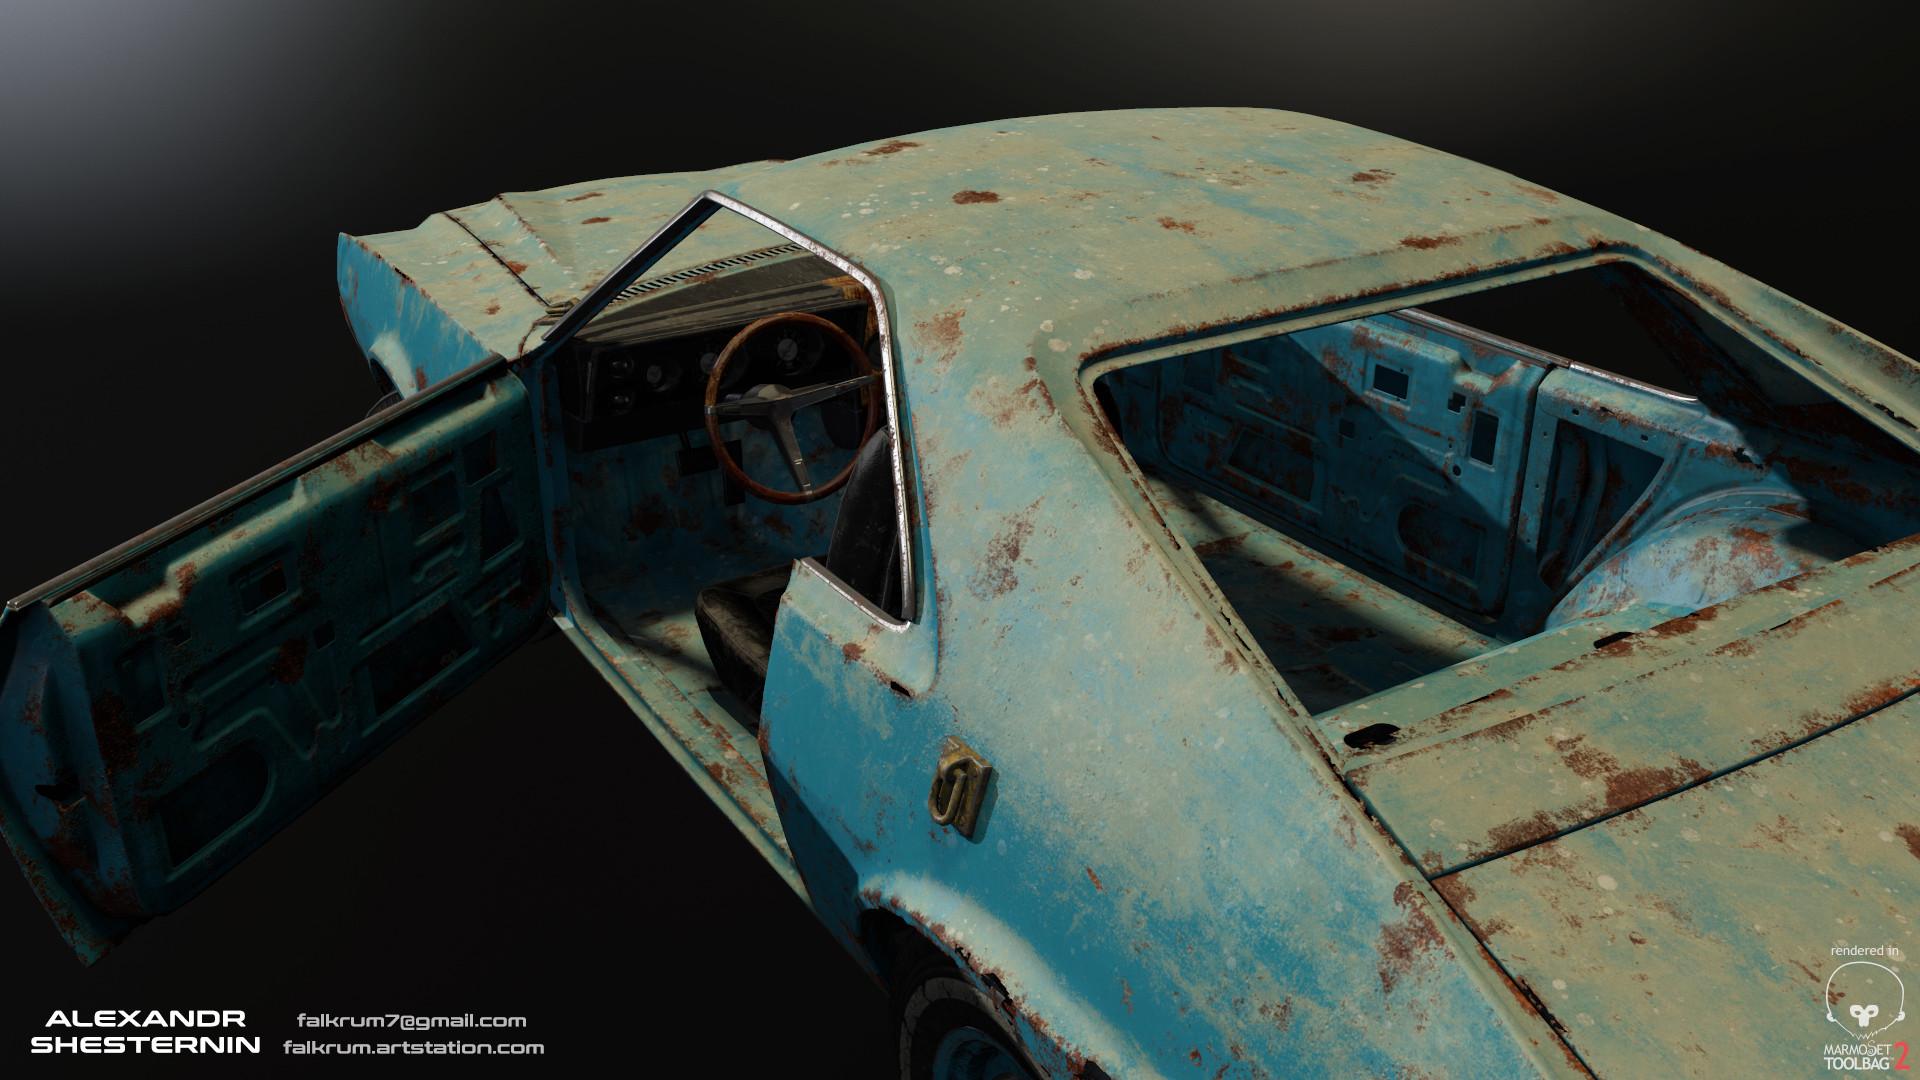 Alexandr shesternin modular abandoned car04